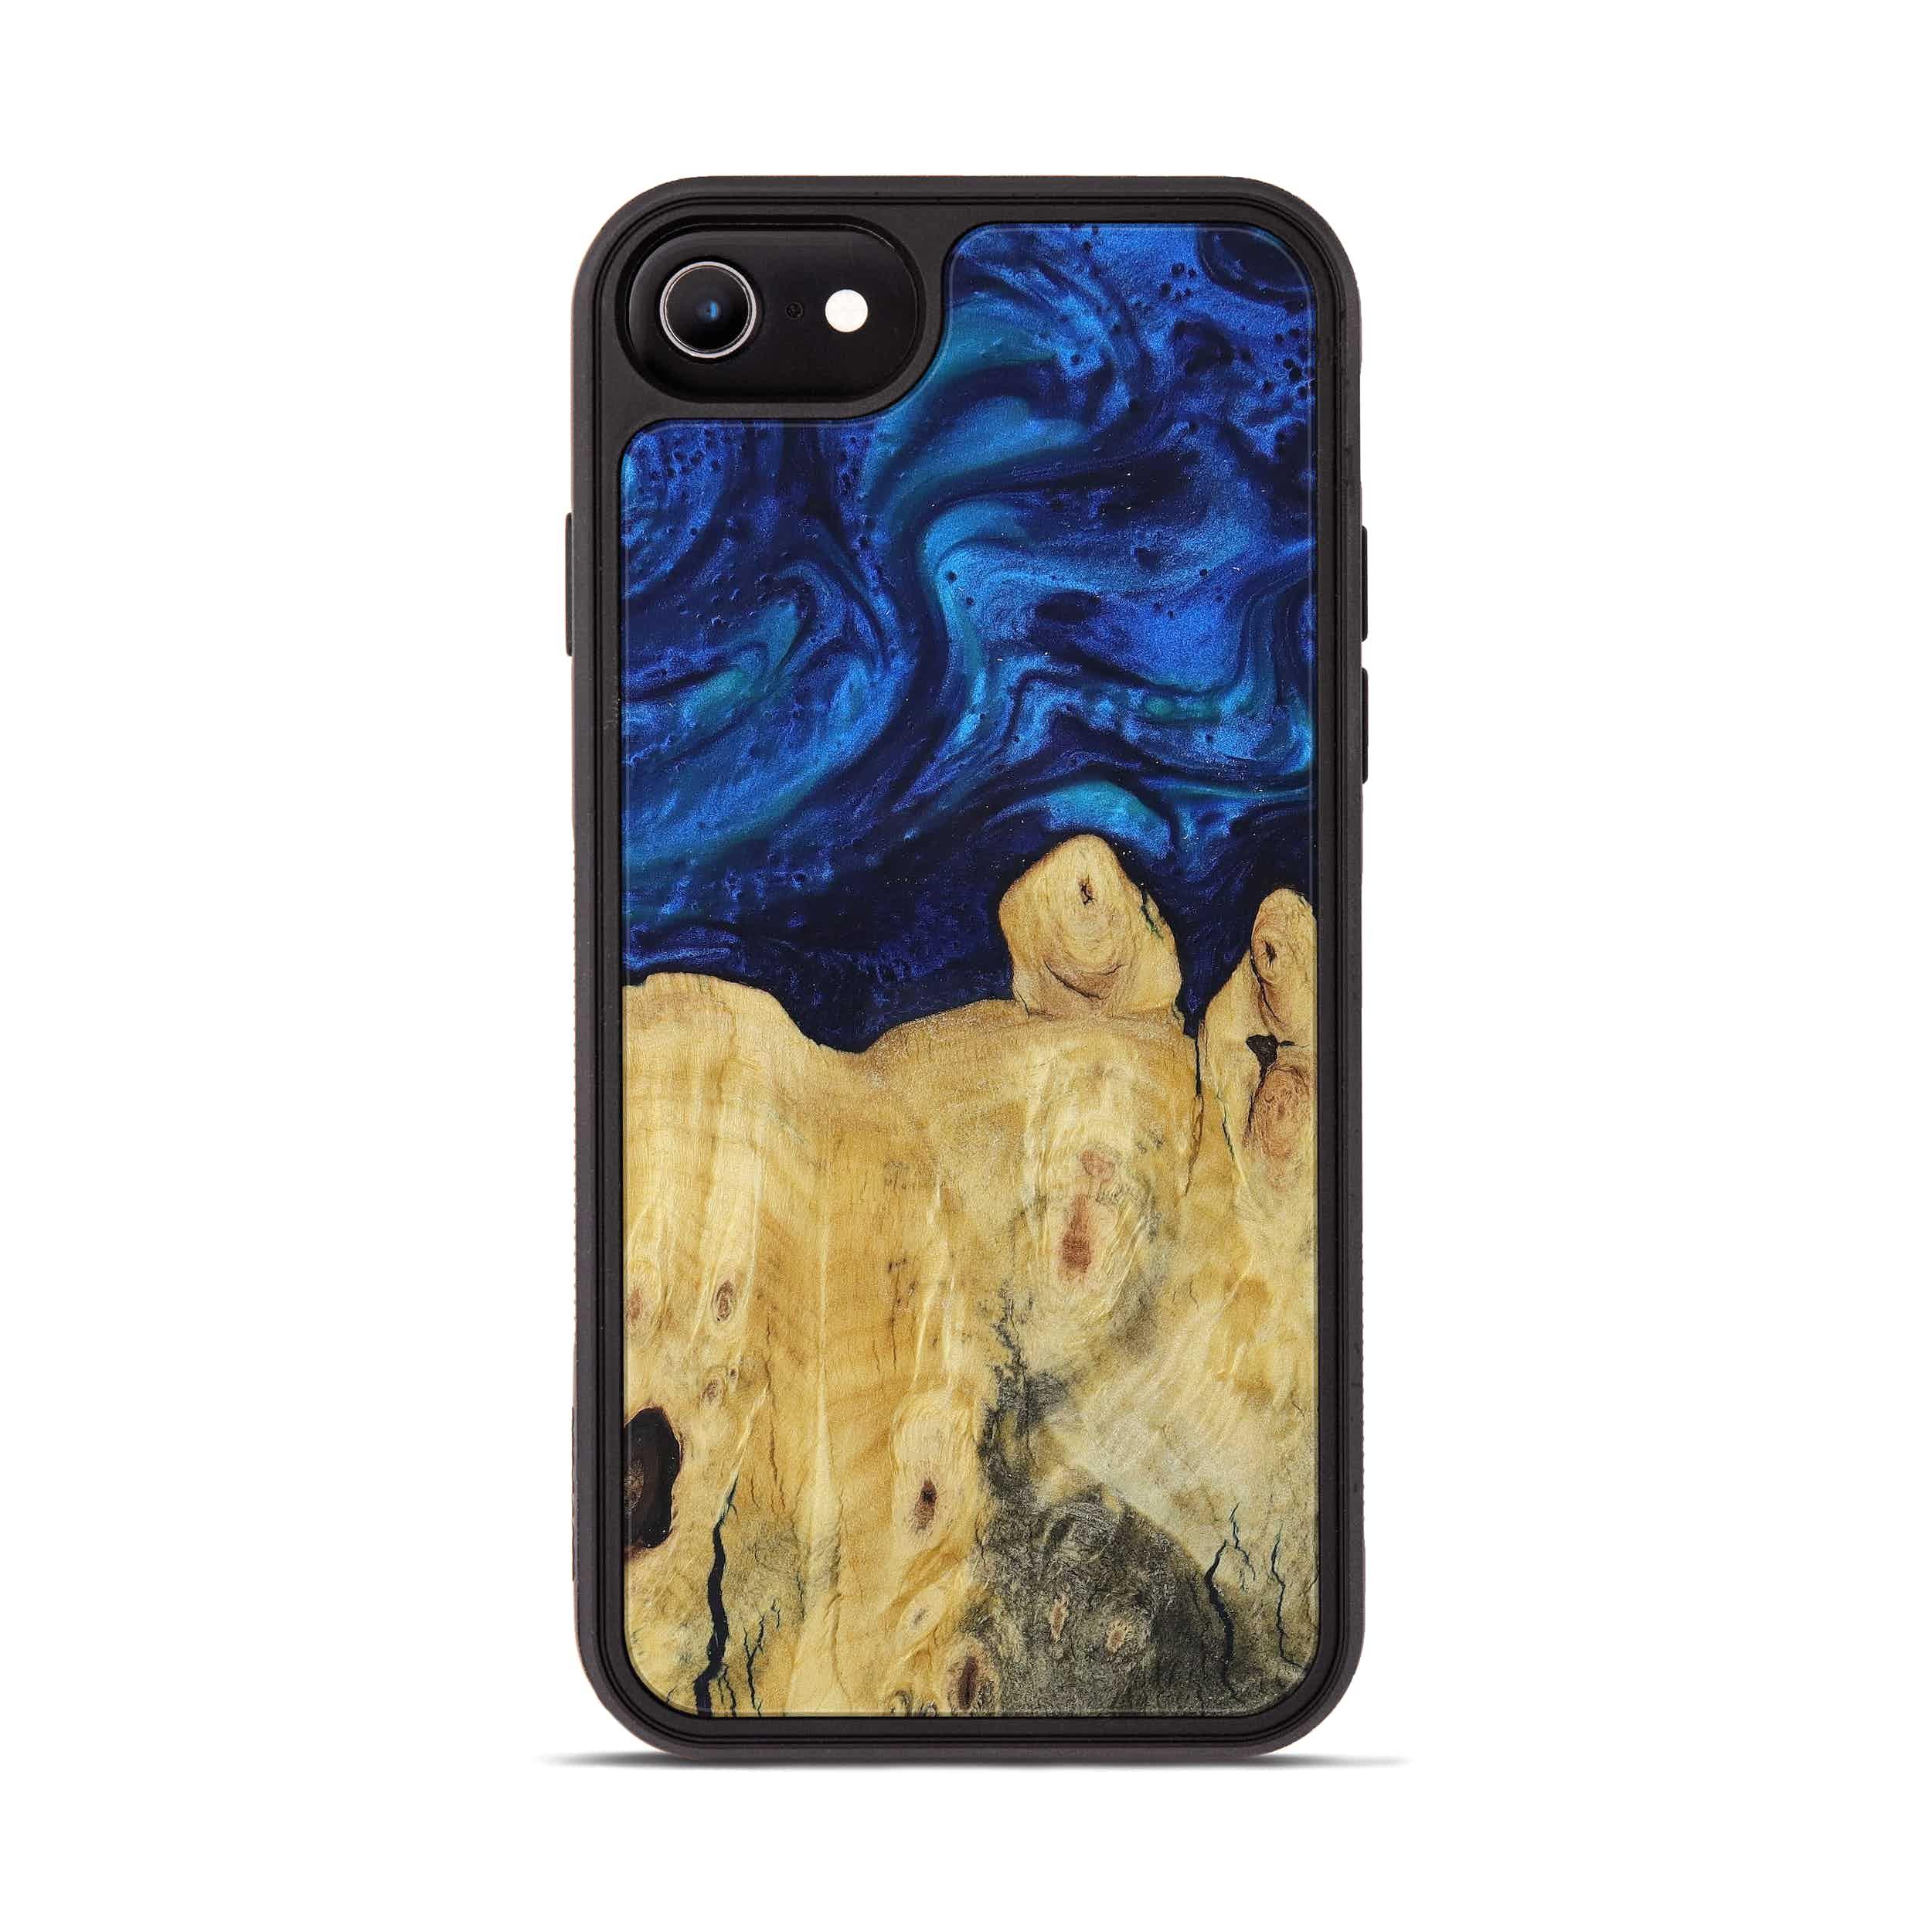 iPhone 8 Wood+Resin Phone Case - Donnamarie (Dark Blue, 394582)